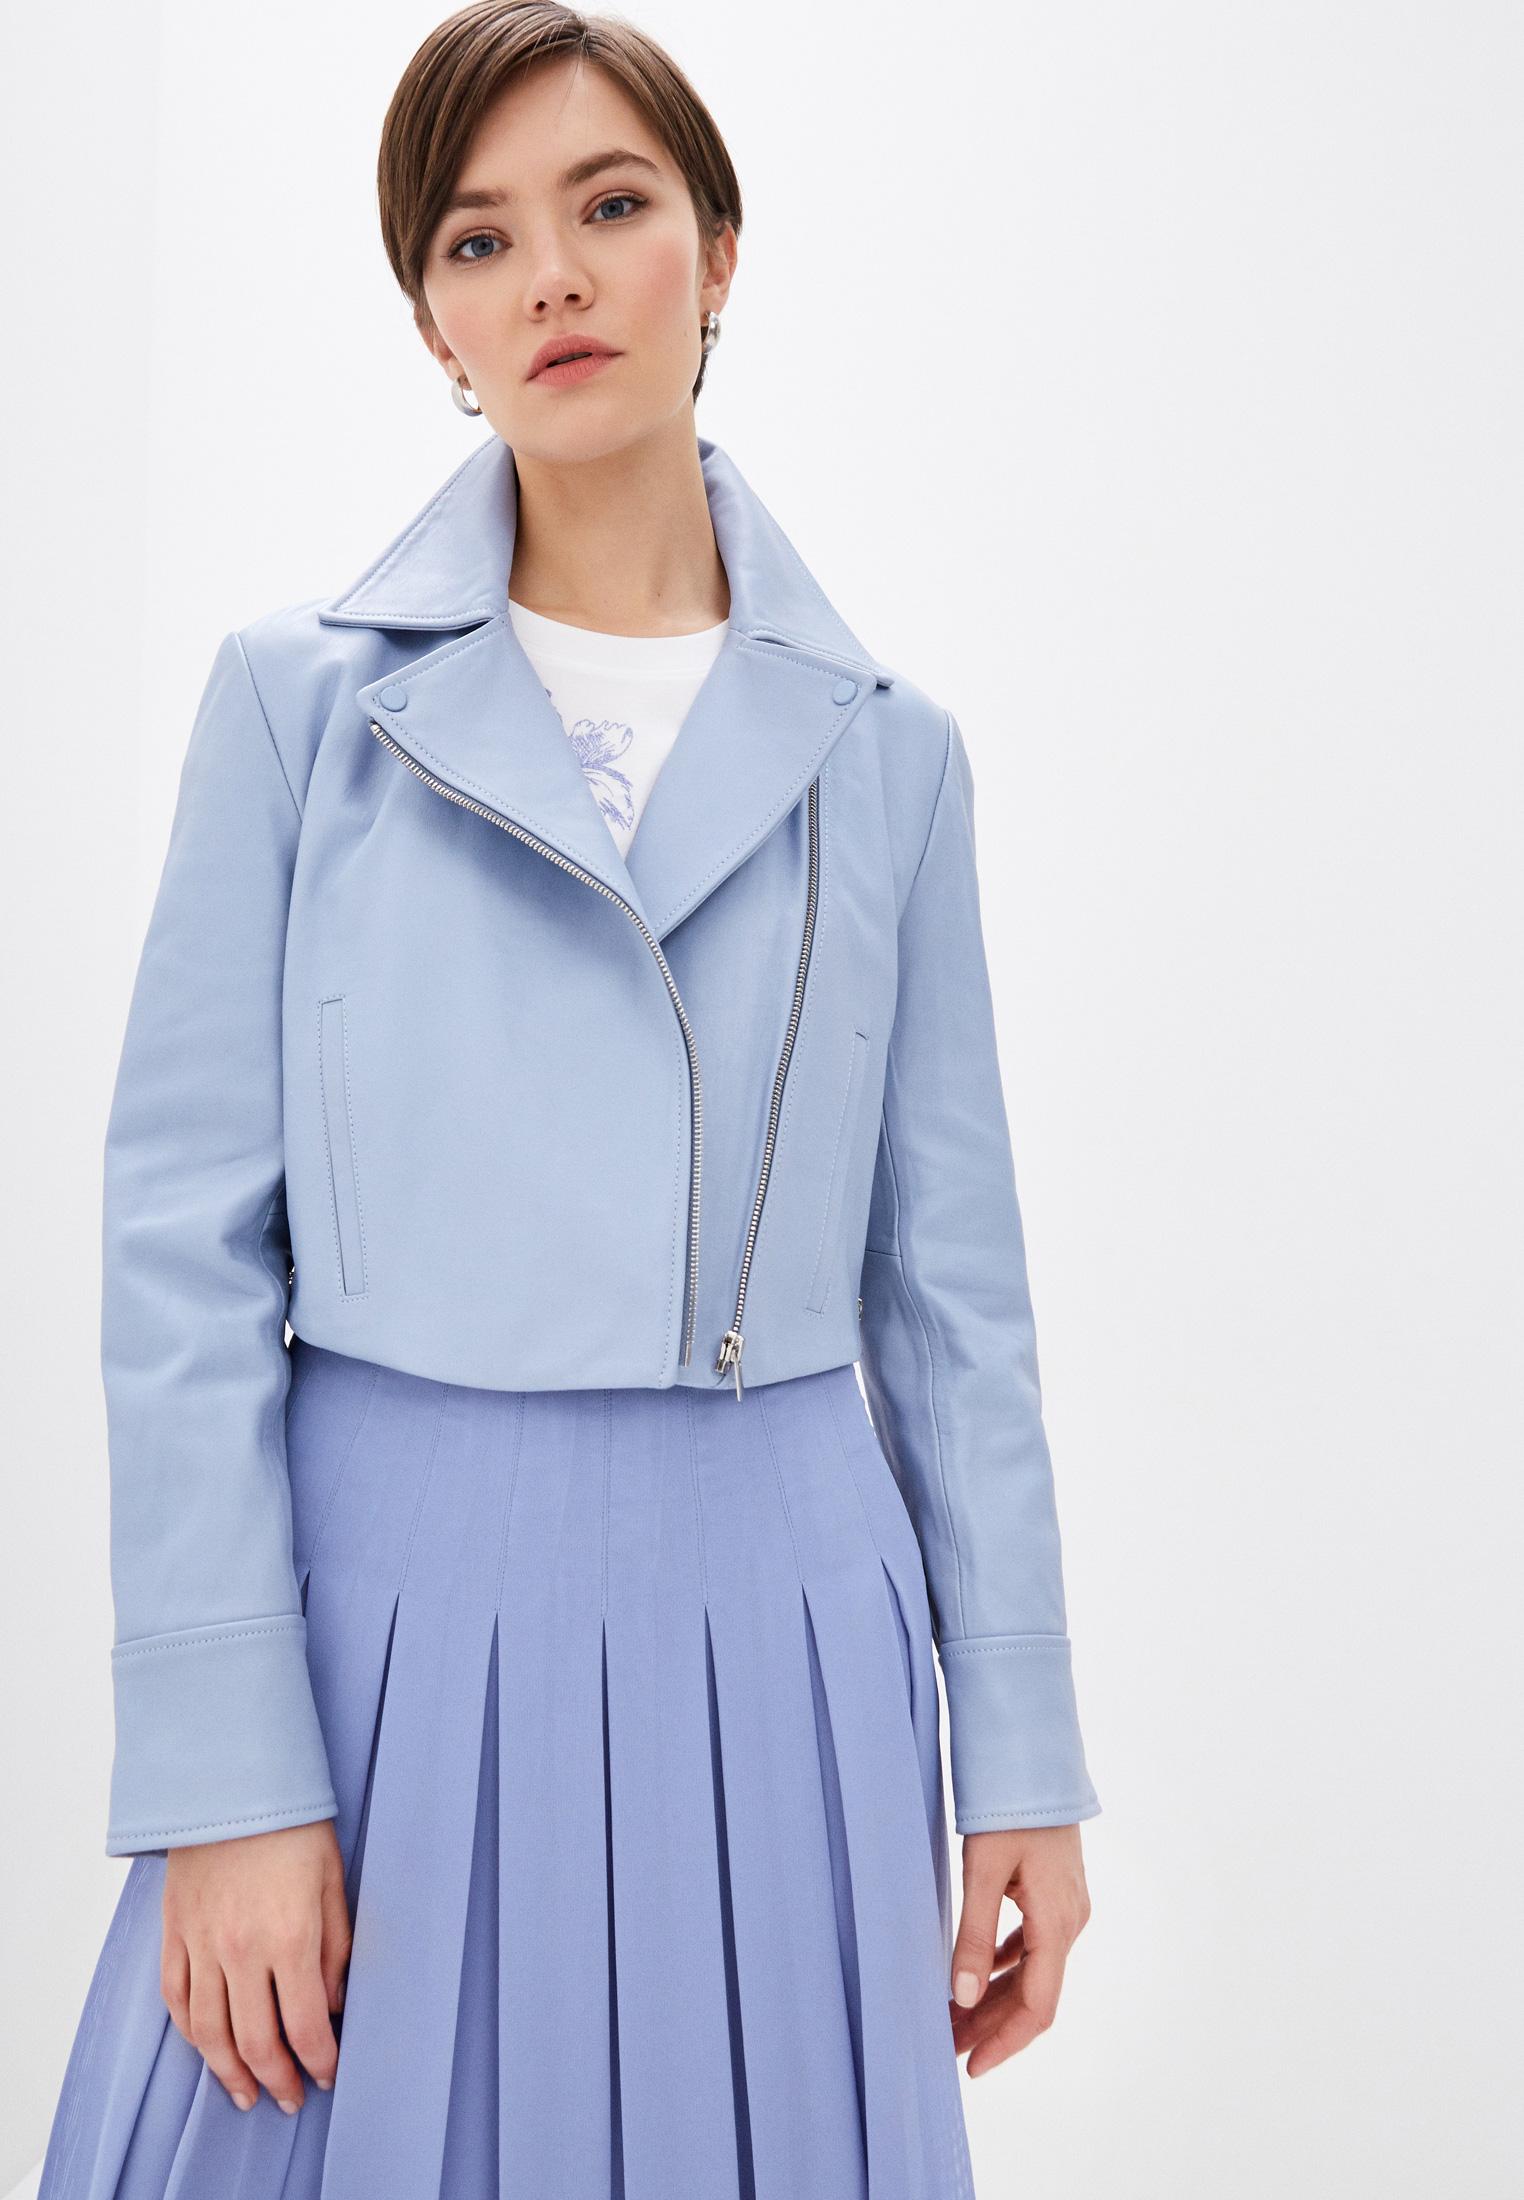 Кожаная куртка Sportmax Code 7441020206